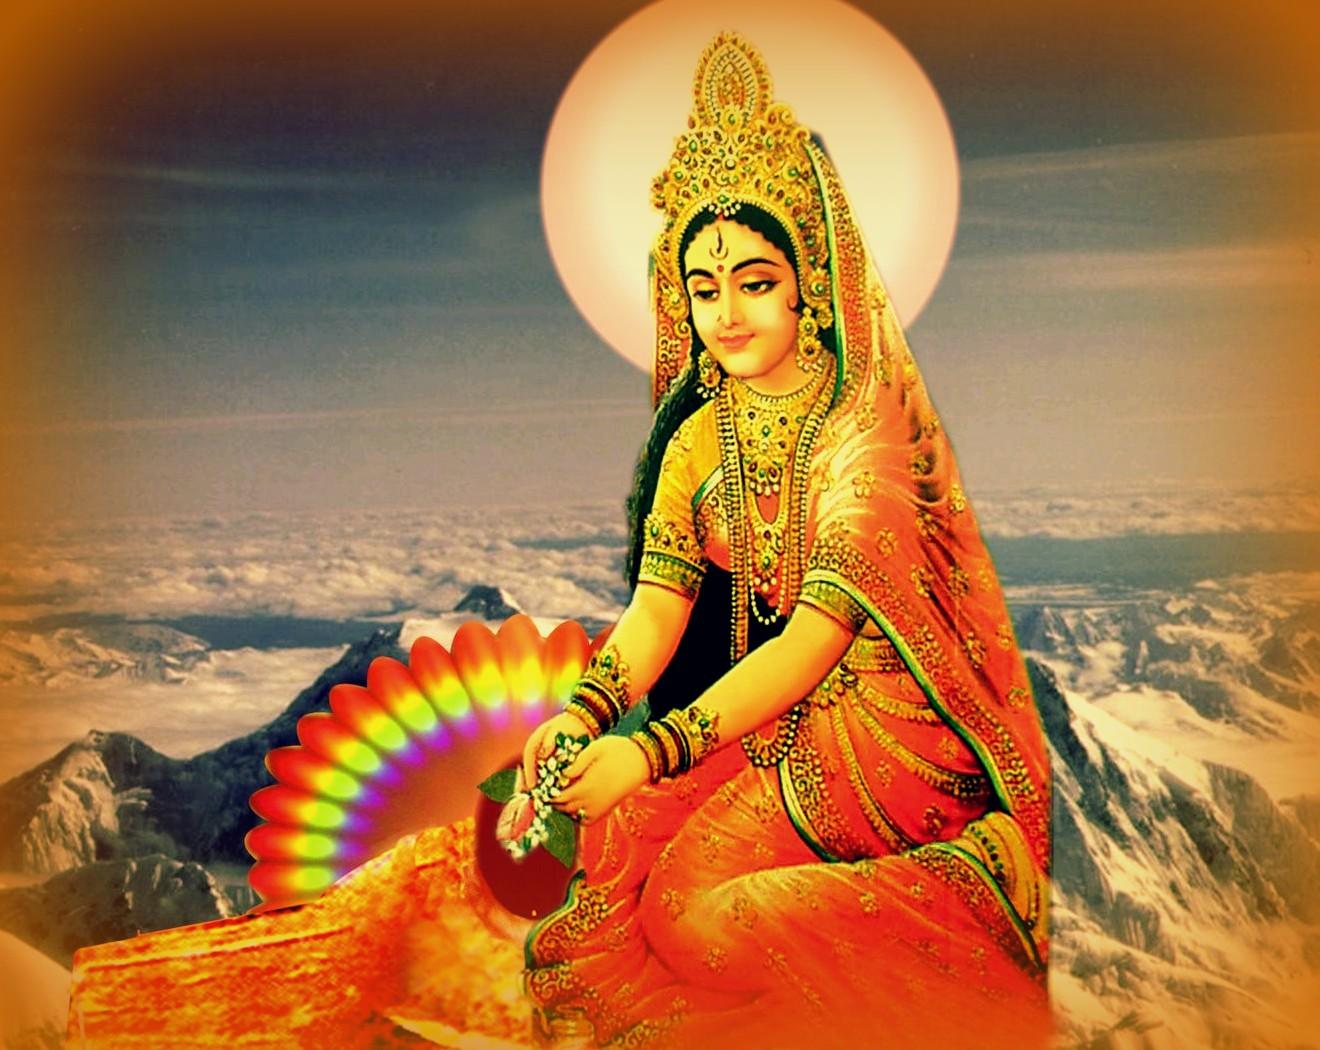 Maa Kali Hd Wallpaper 1080p Goddess Parvati Ganesha The Supreme Lord